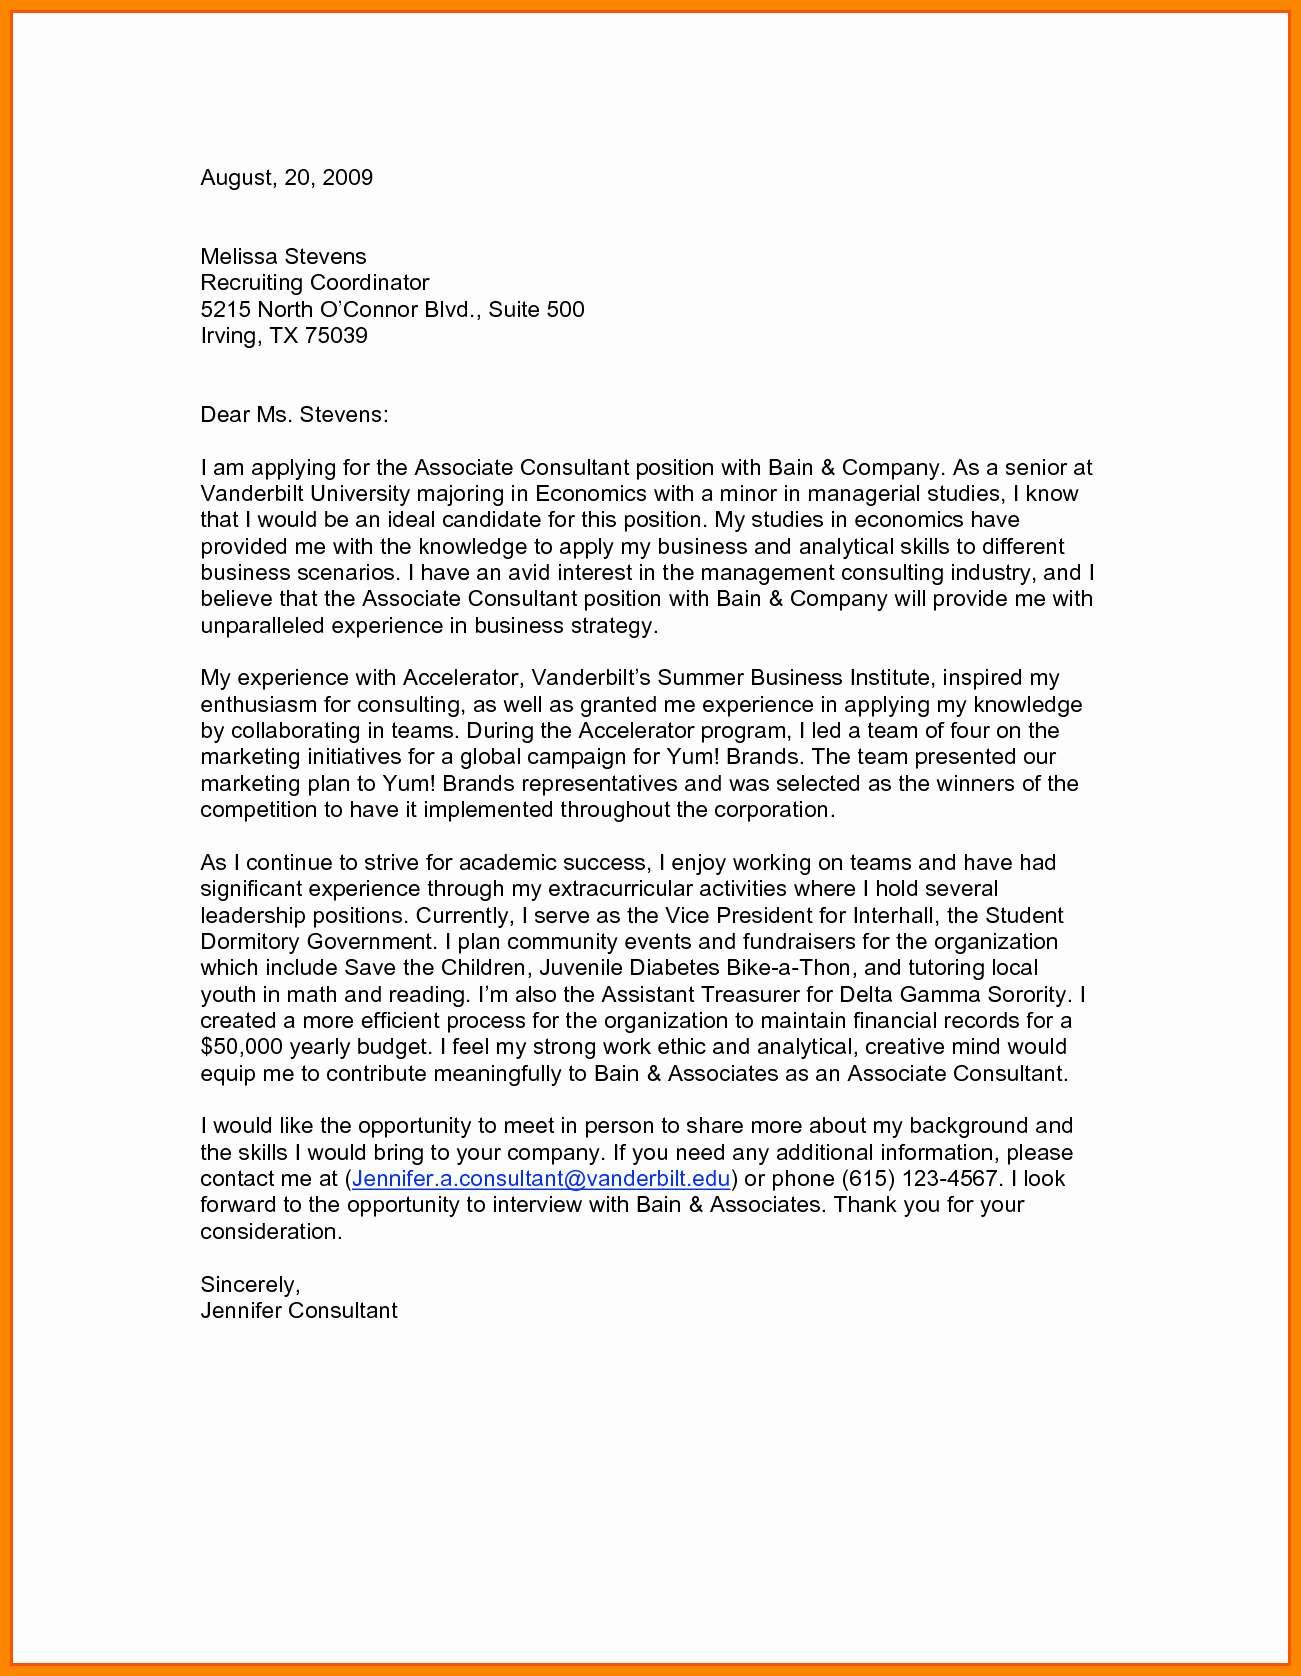 Free Modern Cover Letter Template - Resume Cover Letter Template Free Awesome Od Consultant Cover Letter